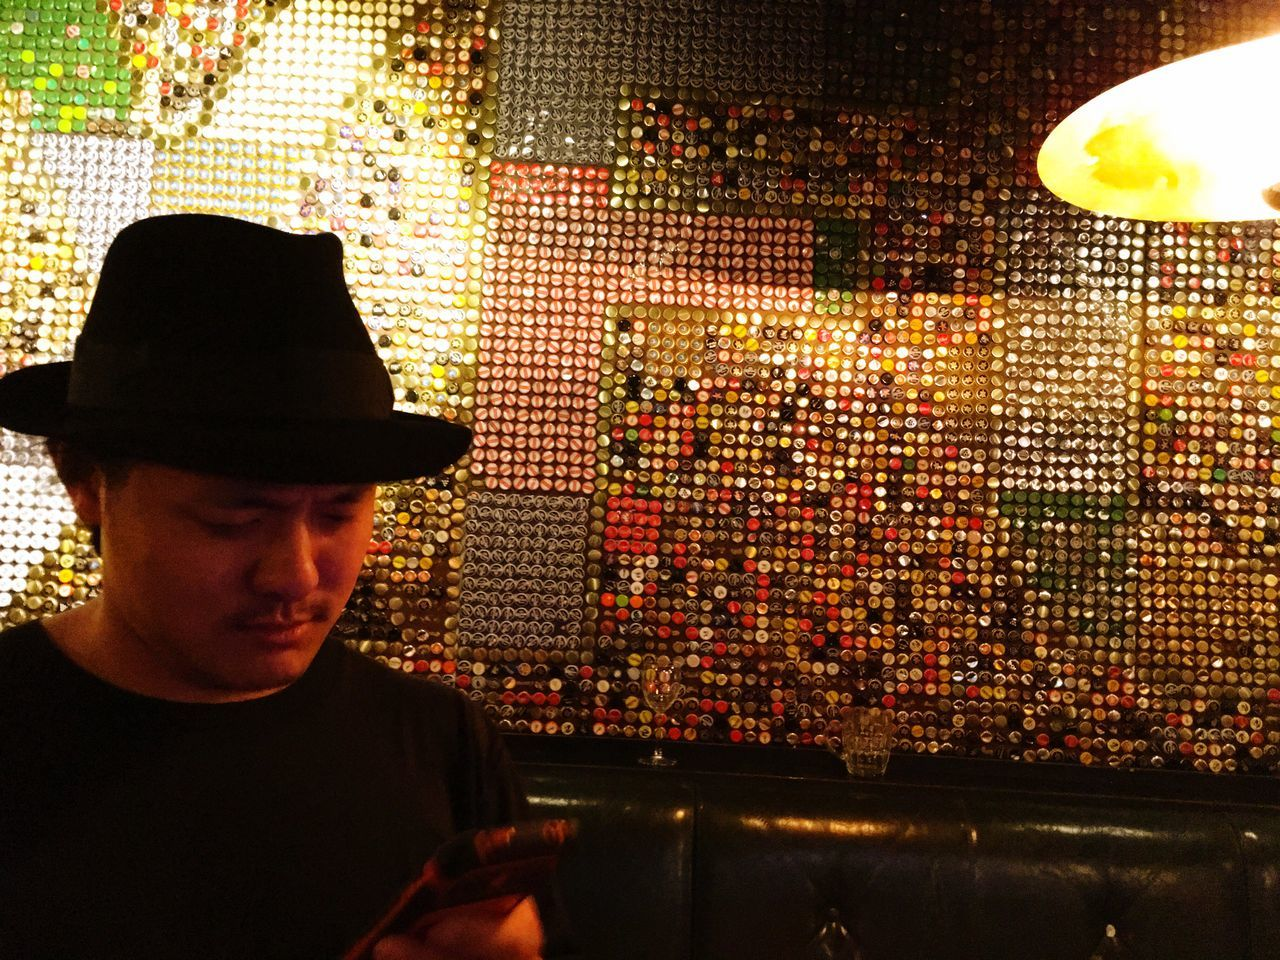 Nightphotography Pub Oxford Tavern Peters Ham